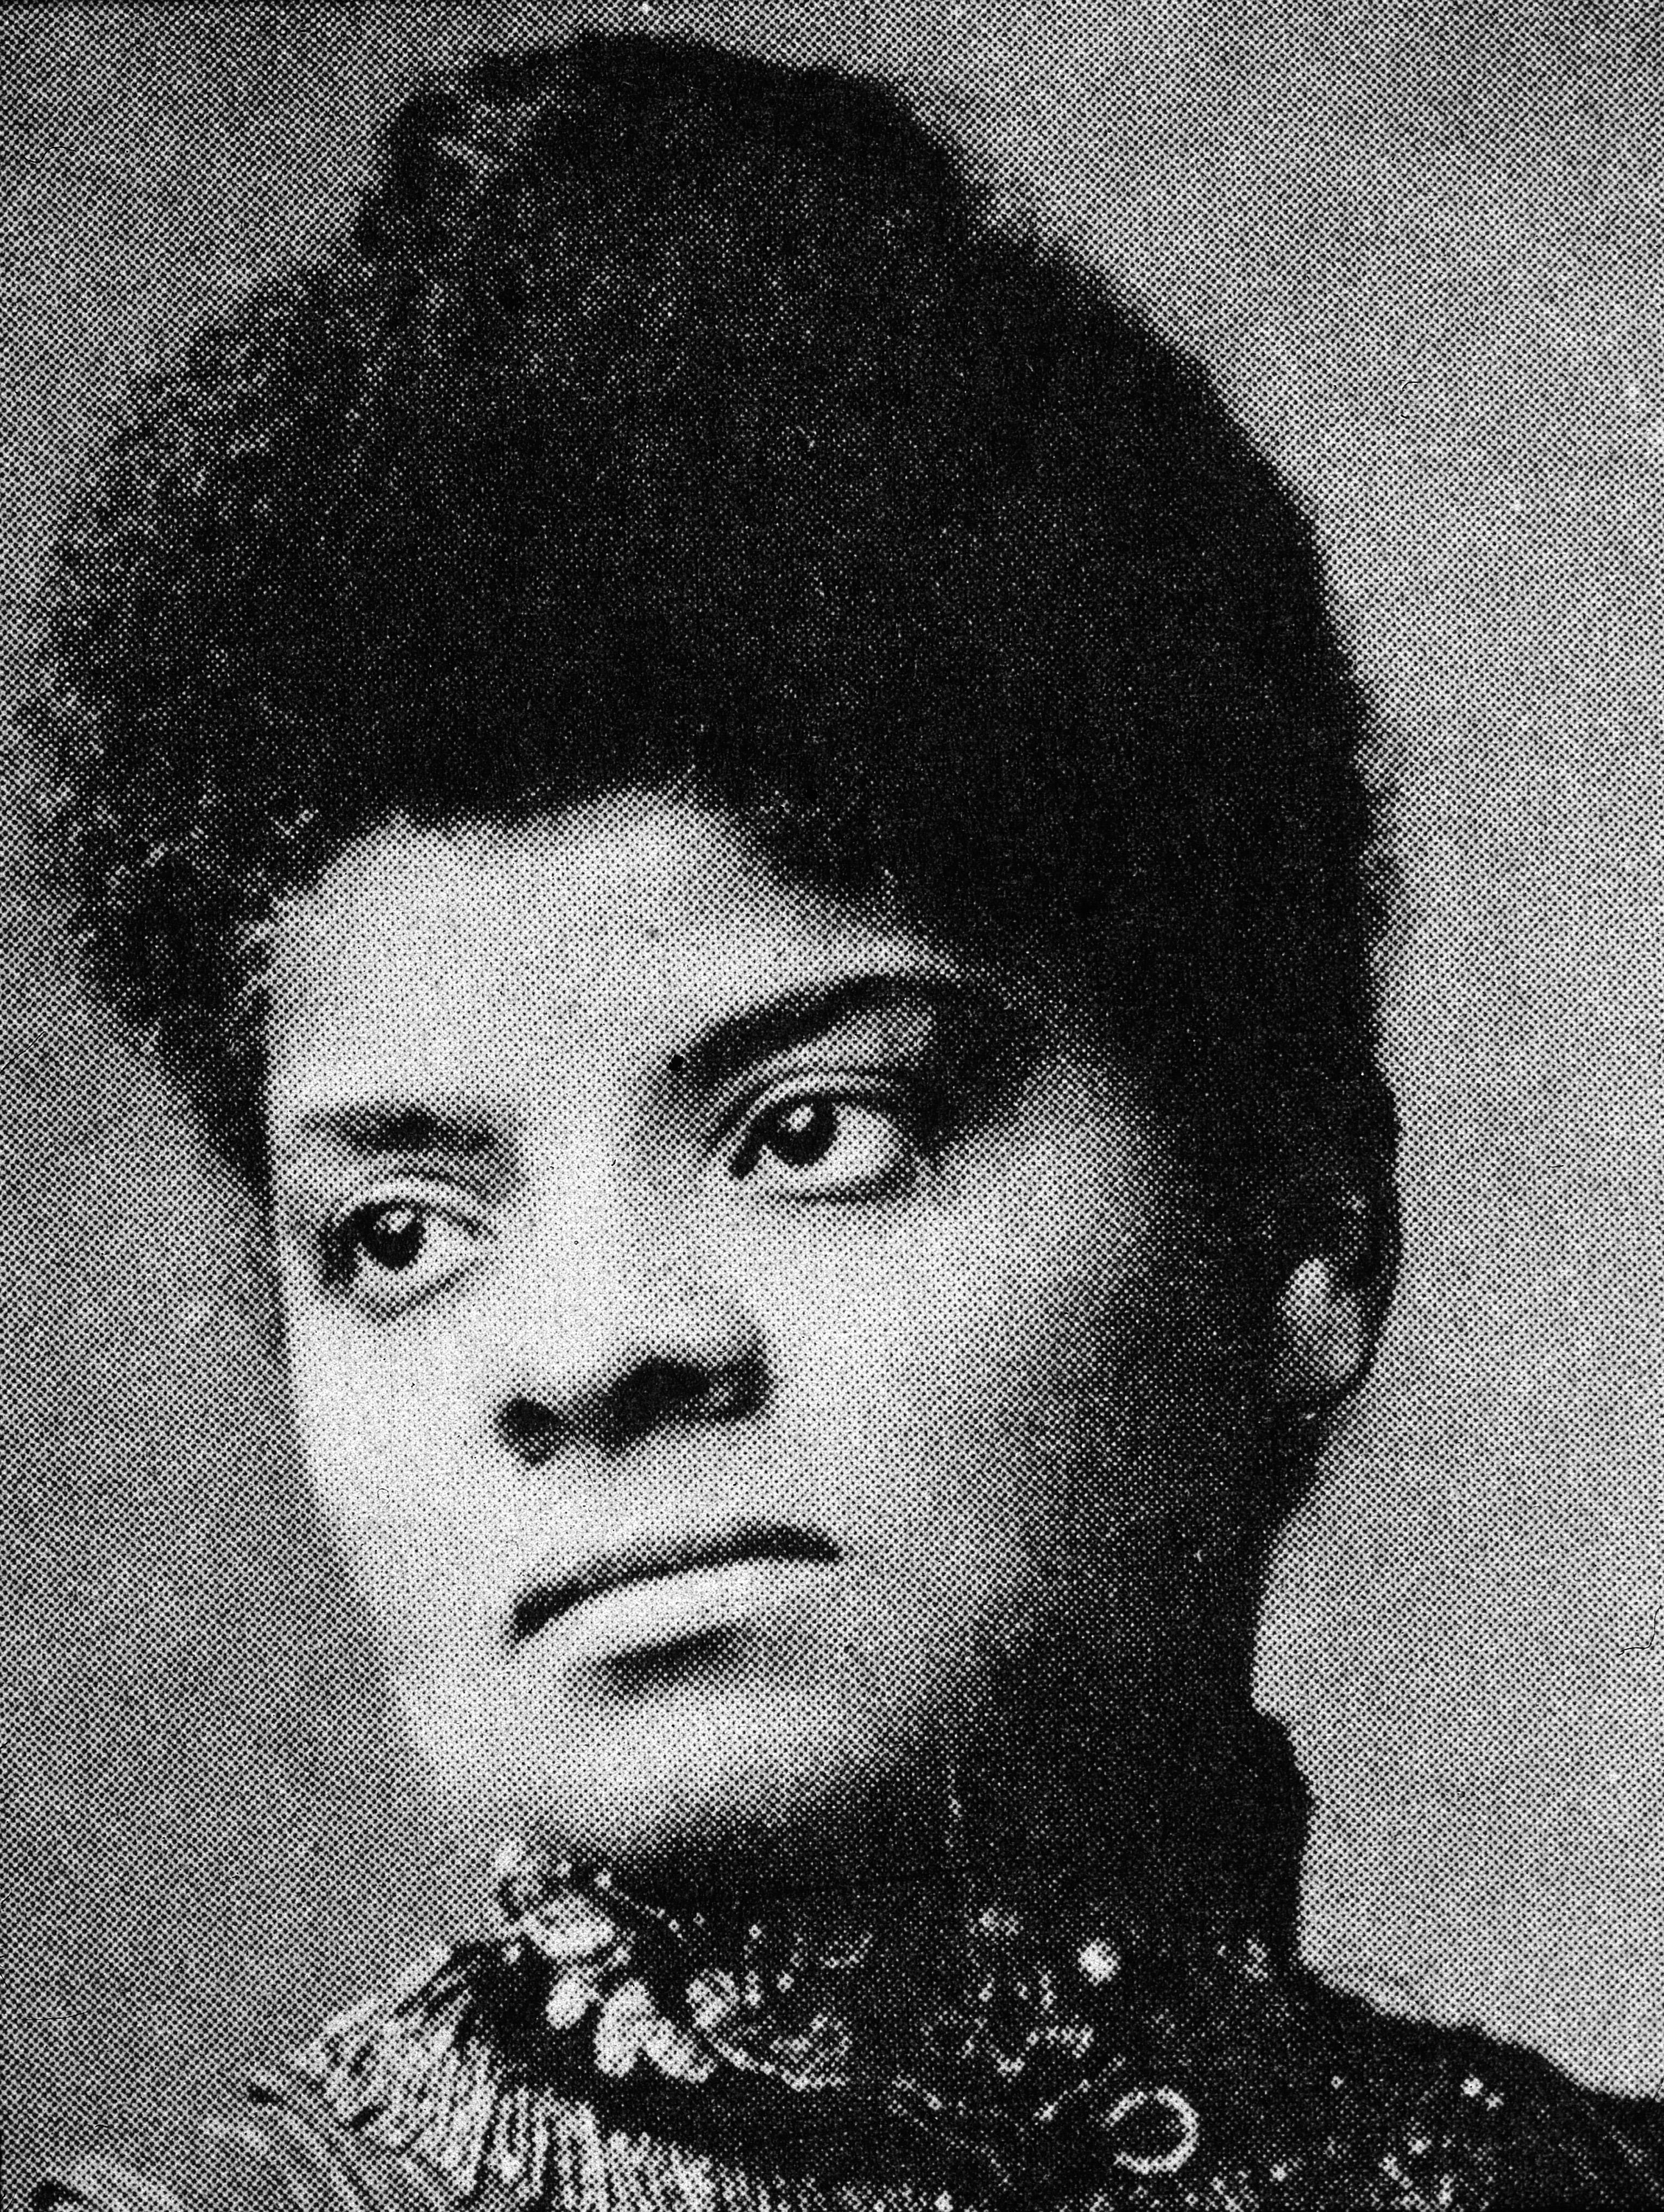 Portrait of American journalist, suffragist and Progressive activist Ida Wells Barnett, also known as Ida B. Wells, in the 1890s.